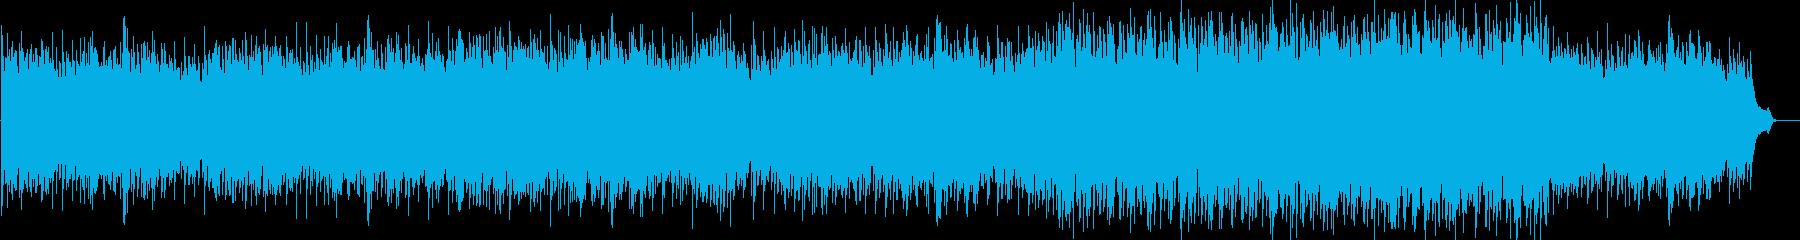 Antarcticaの再生済みの波形